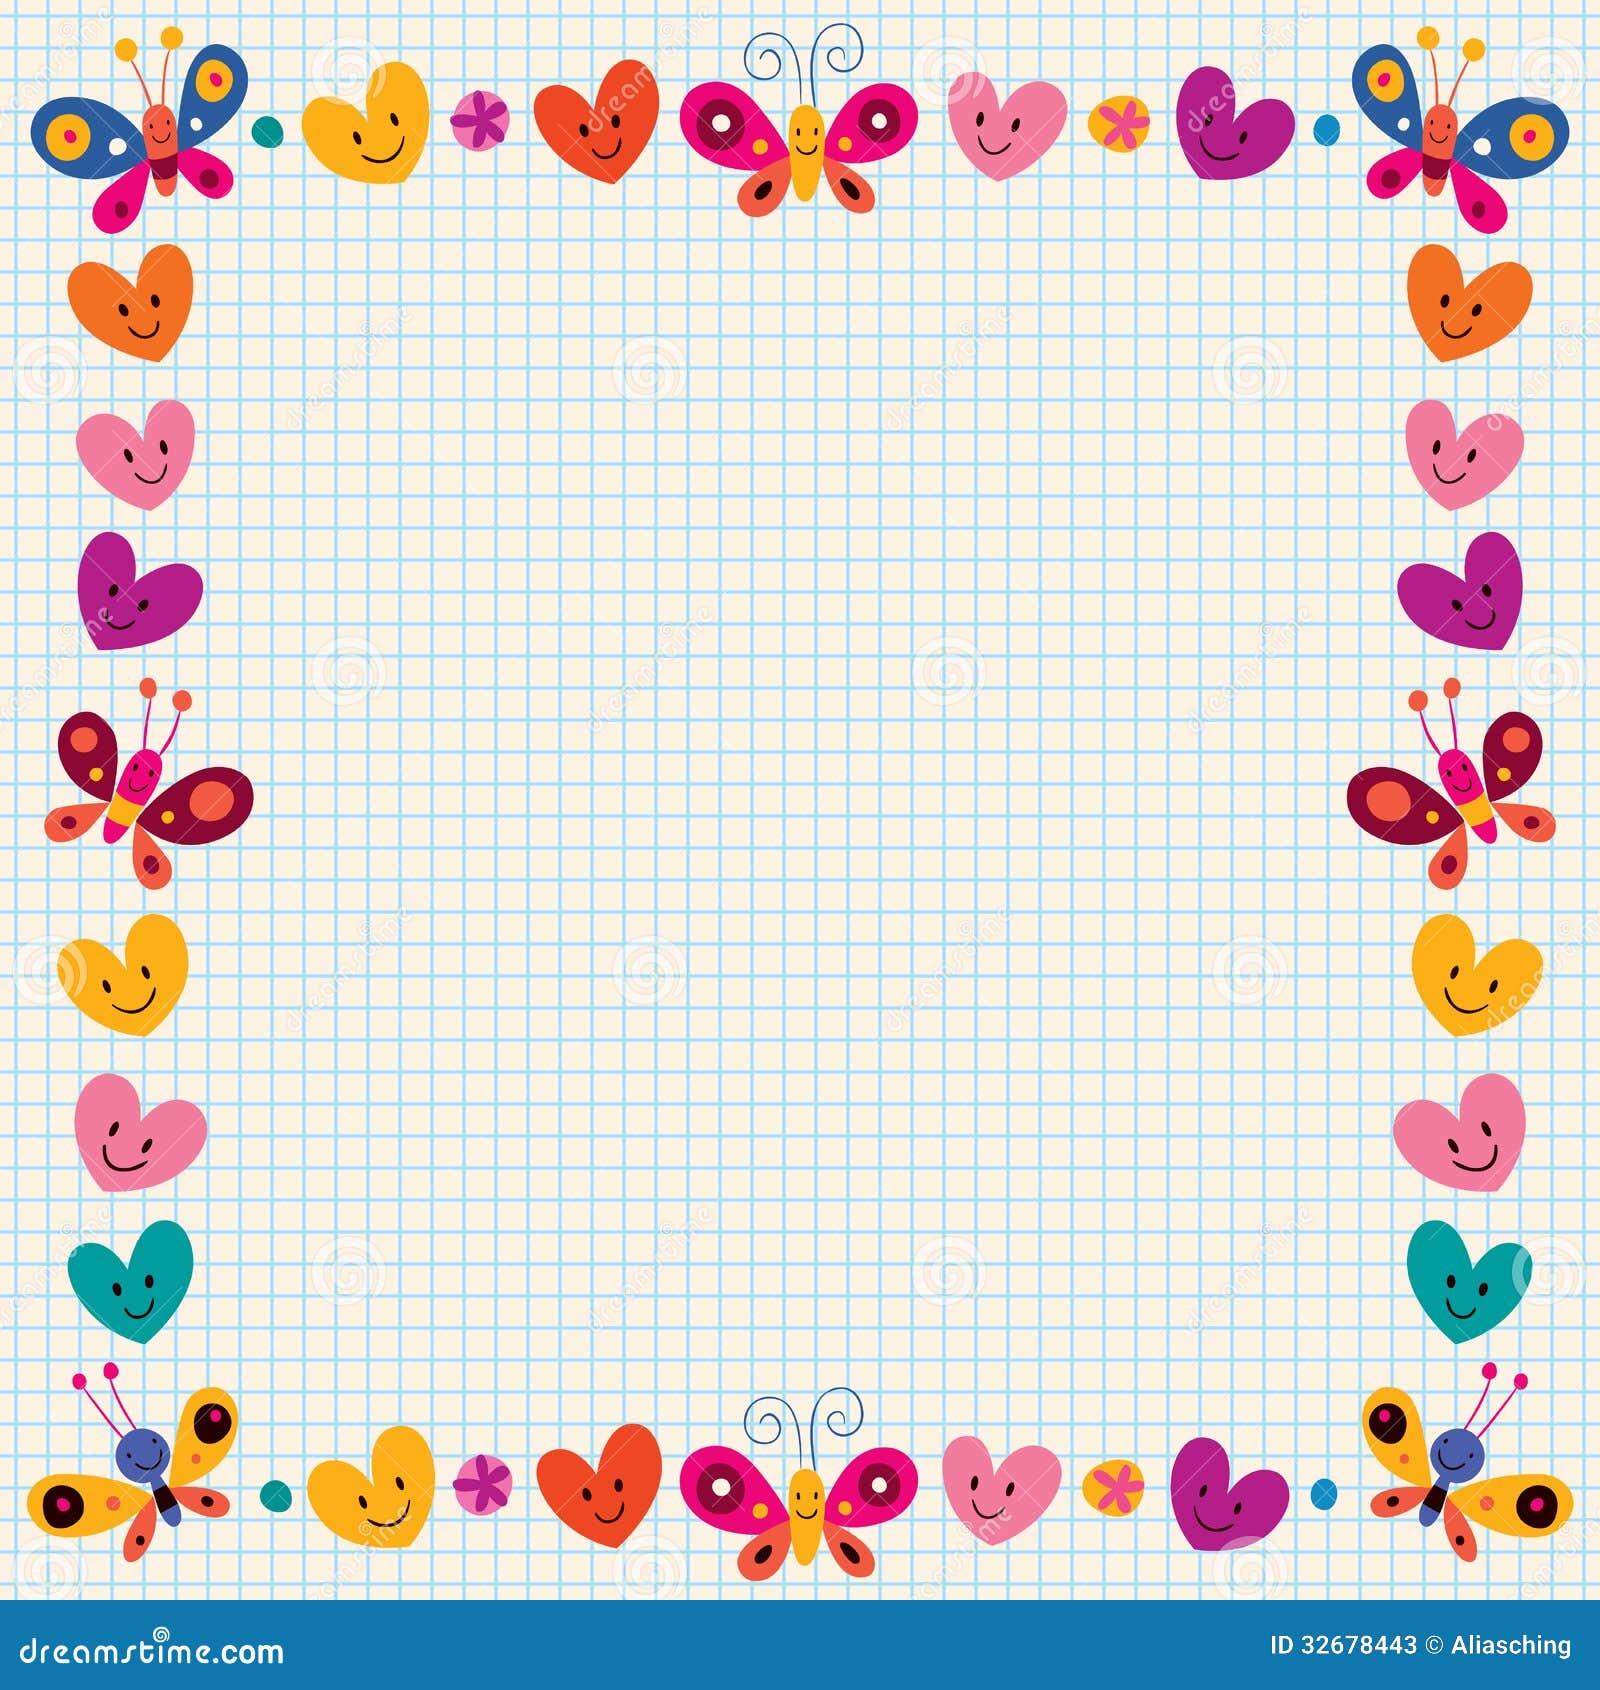 Cartoon Character Border Design : Butterflies hearts border stock vector image